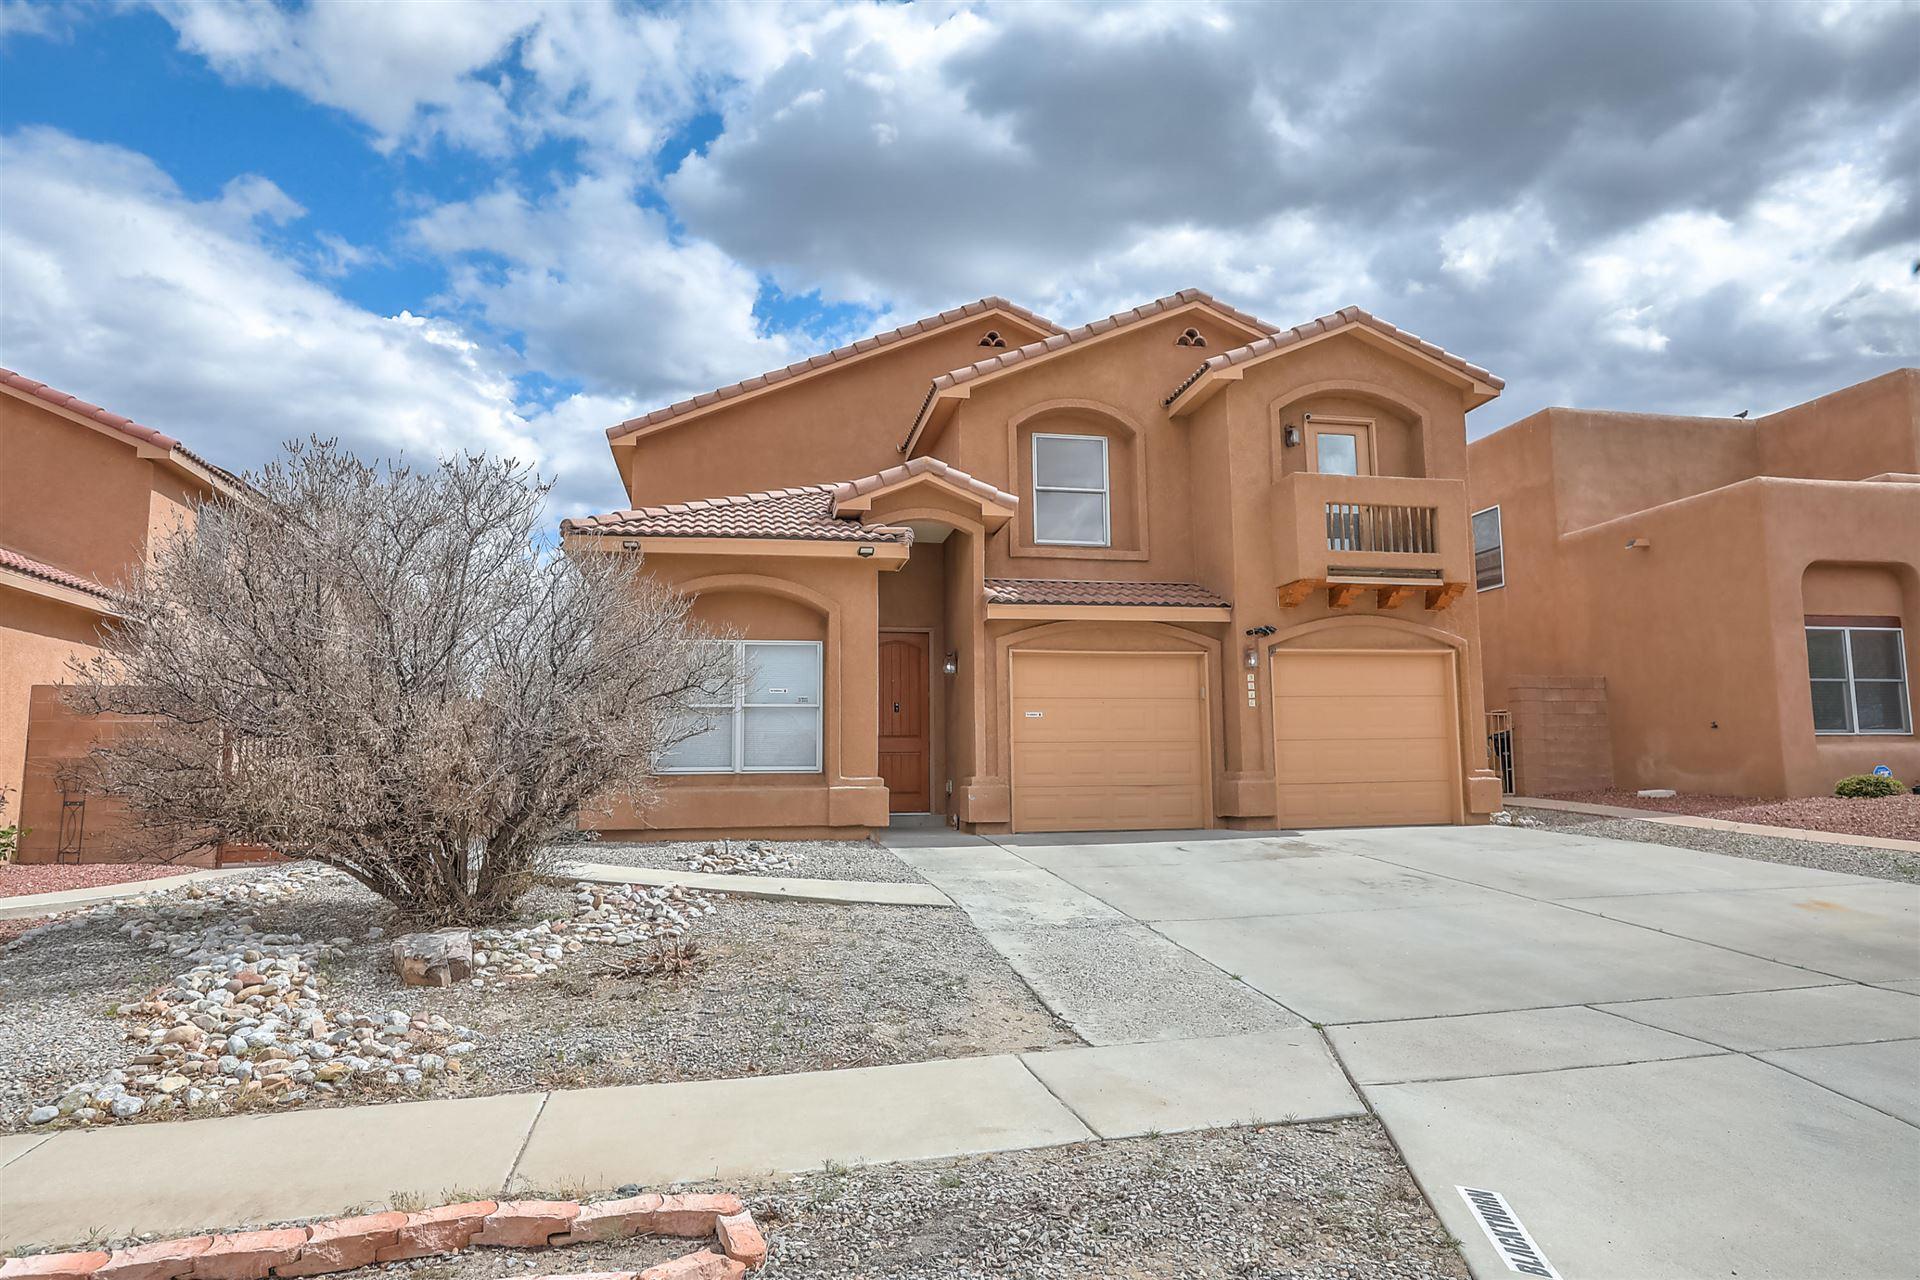 9316 SILICA Avenue NW, Albuquerque, NM 87120 - MLS#: 991395